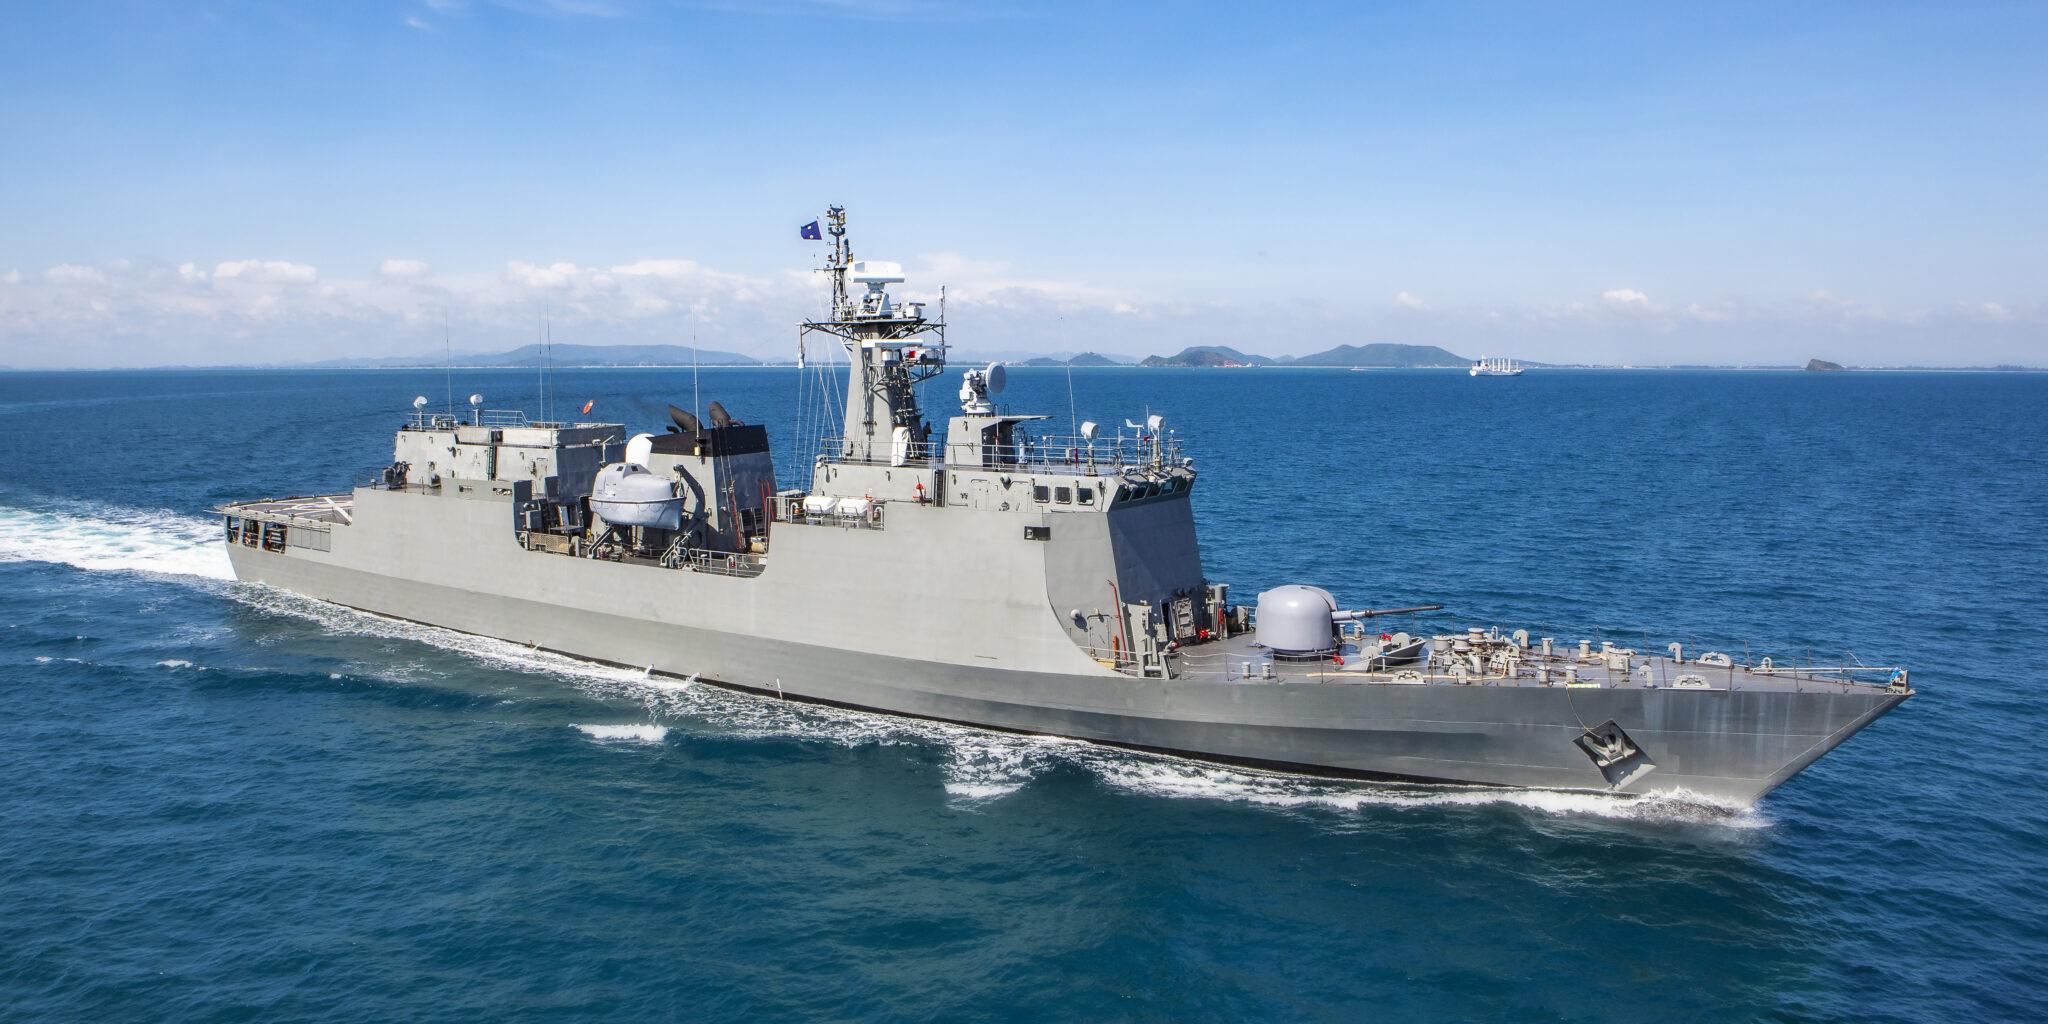 Navy Battleship at sea.